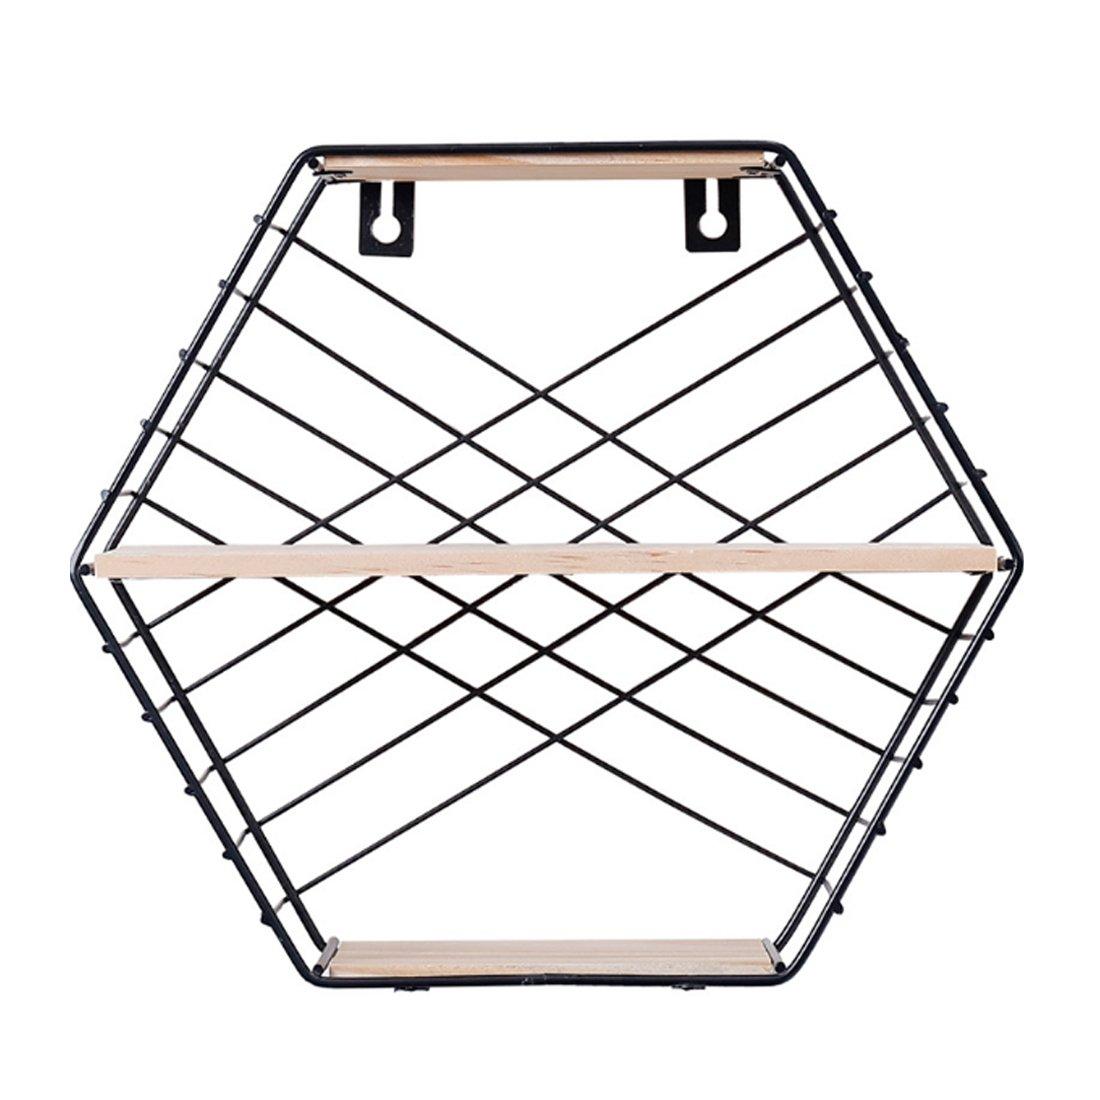 HMANE 3-Tier Wall Storage Rack,Decorative Hanging Hexagon Shelf Organizer for Kitchen,Bathroom,Office - Black by HMANE (Image #7)